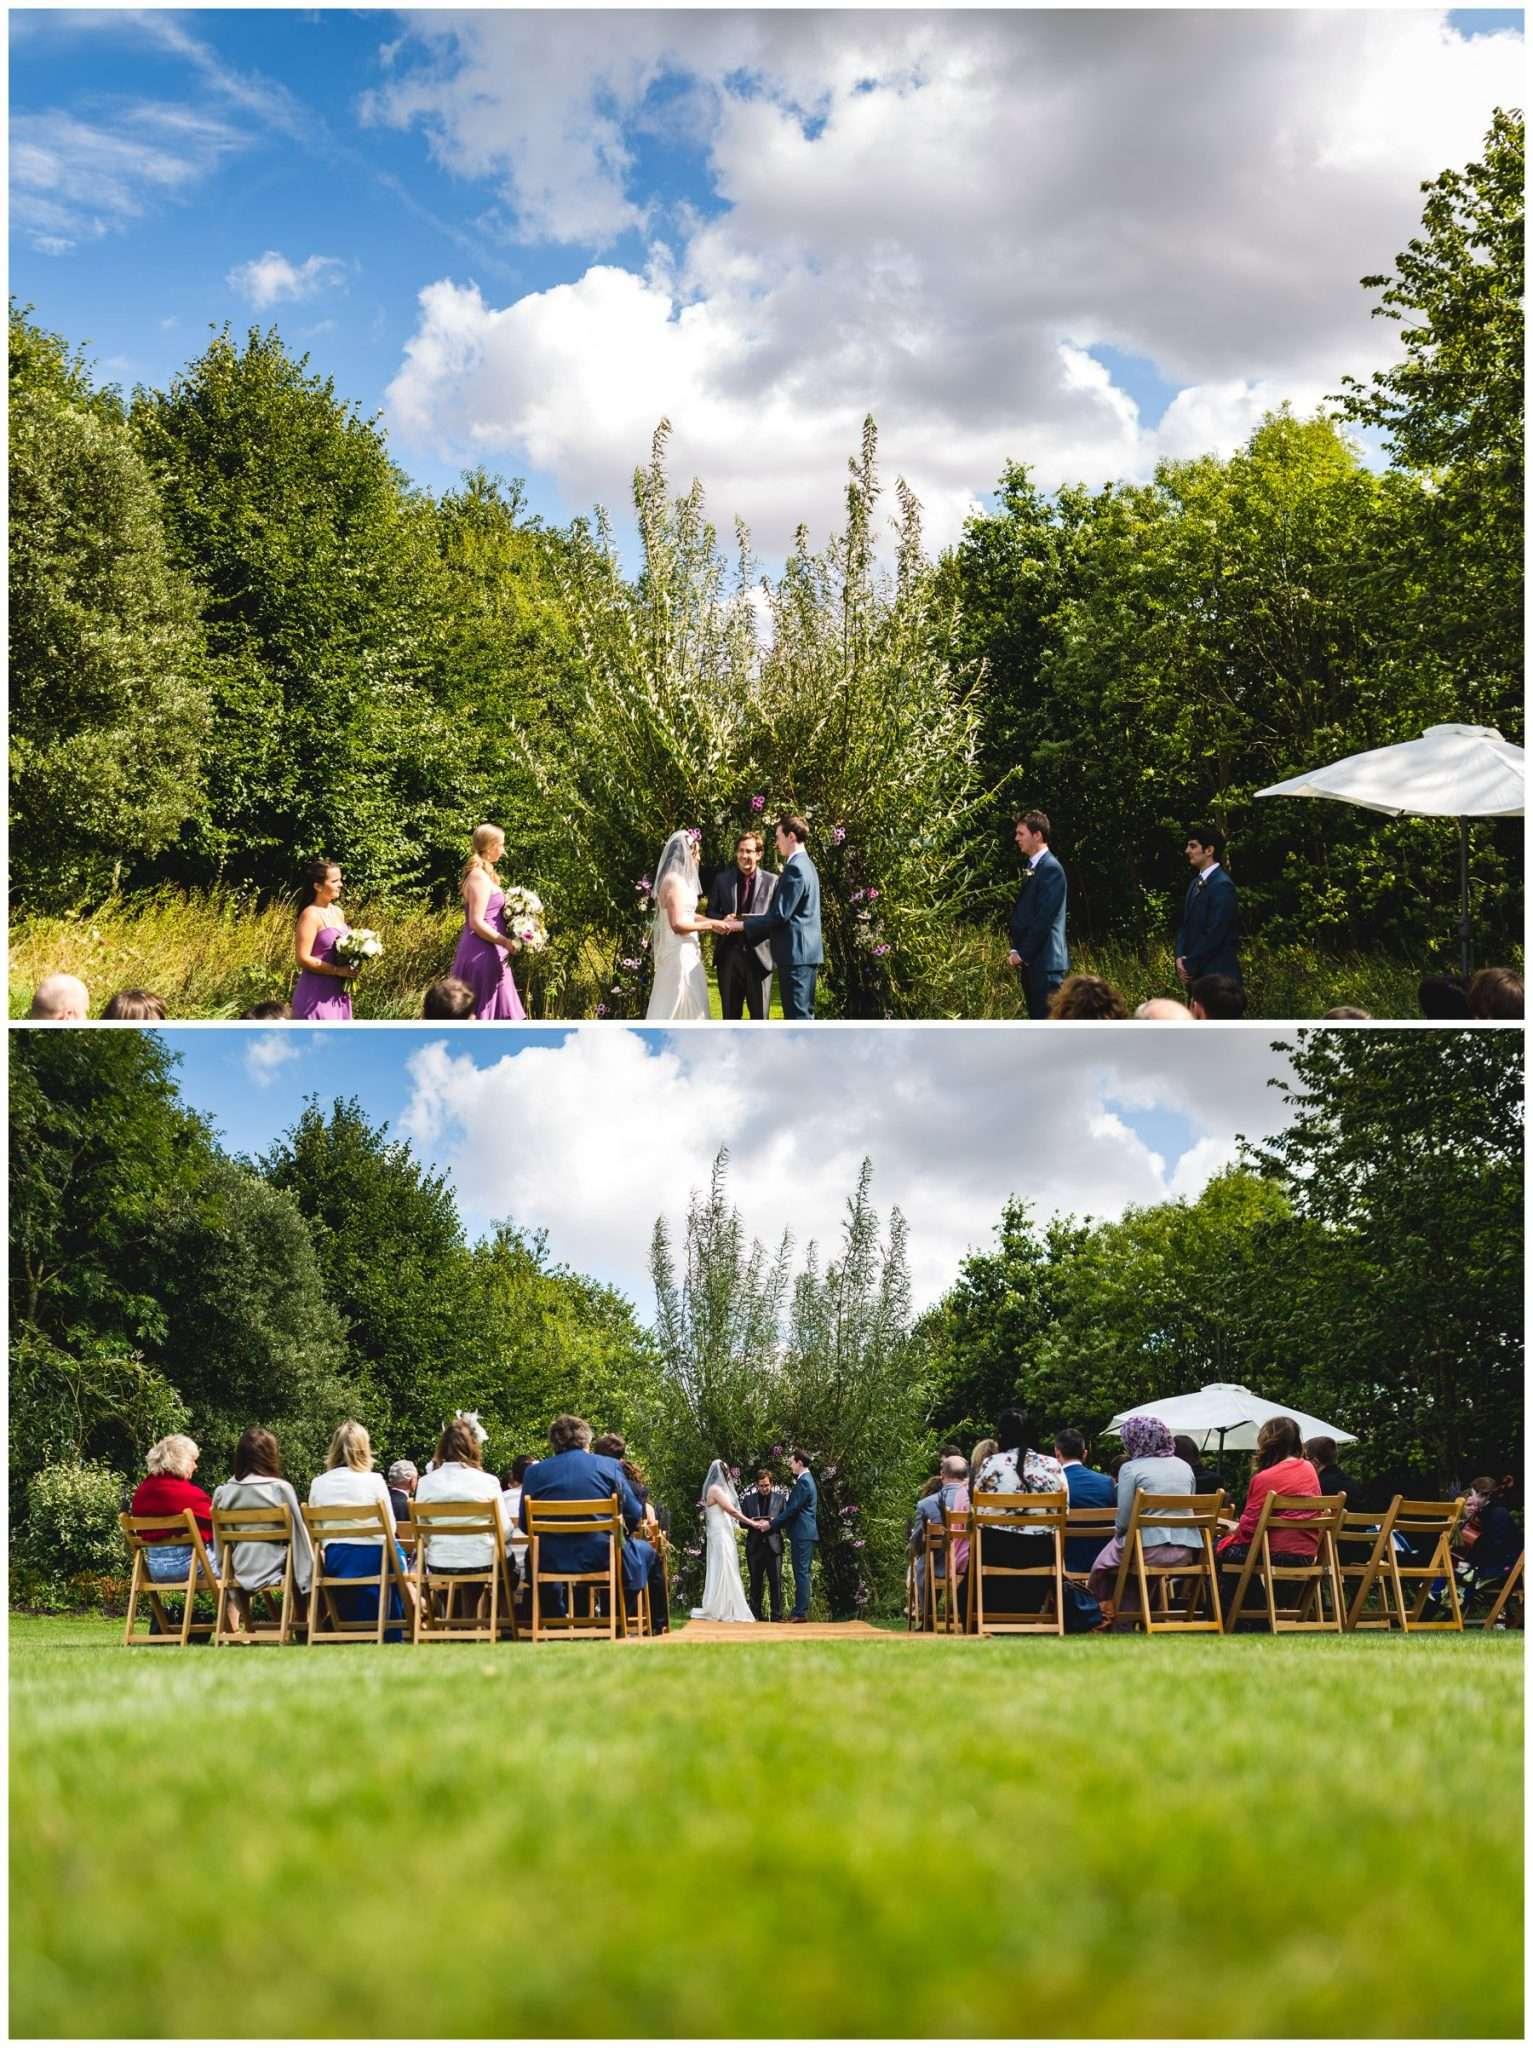 chaucer barn wedding ben and brooke norfolk wedding